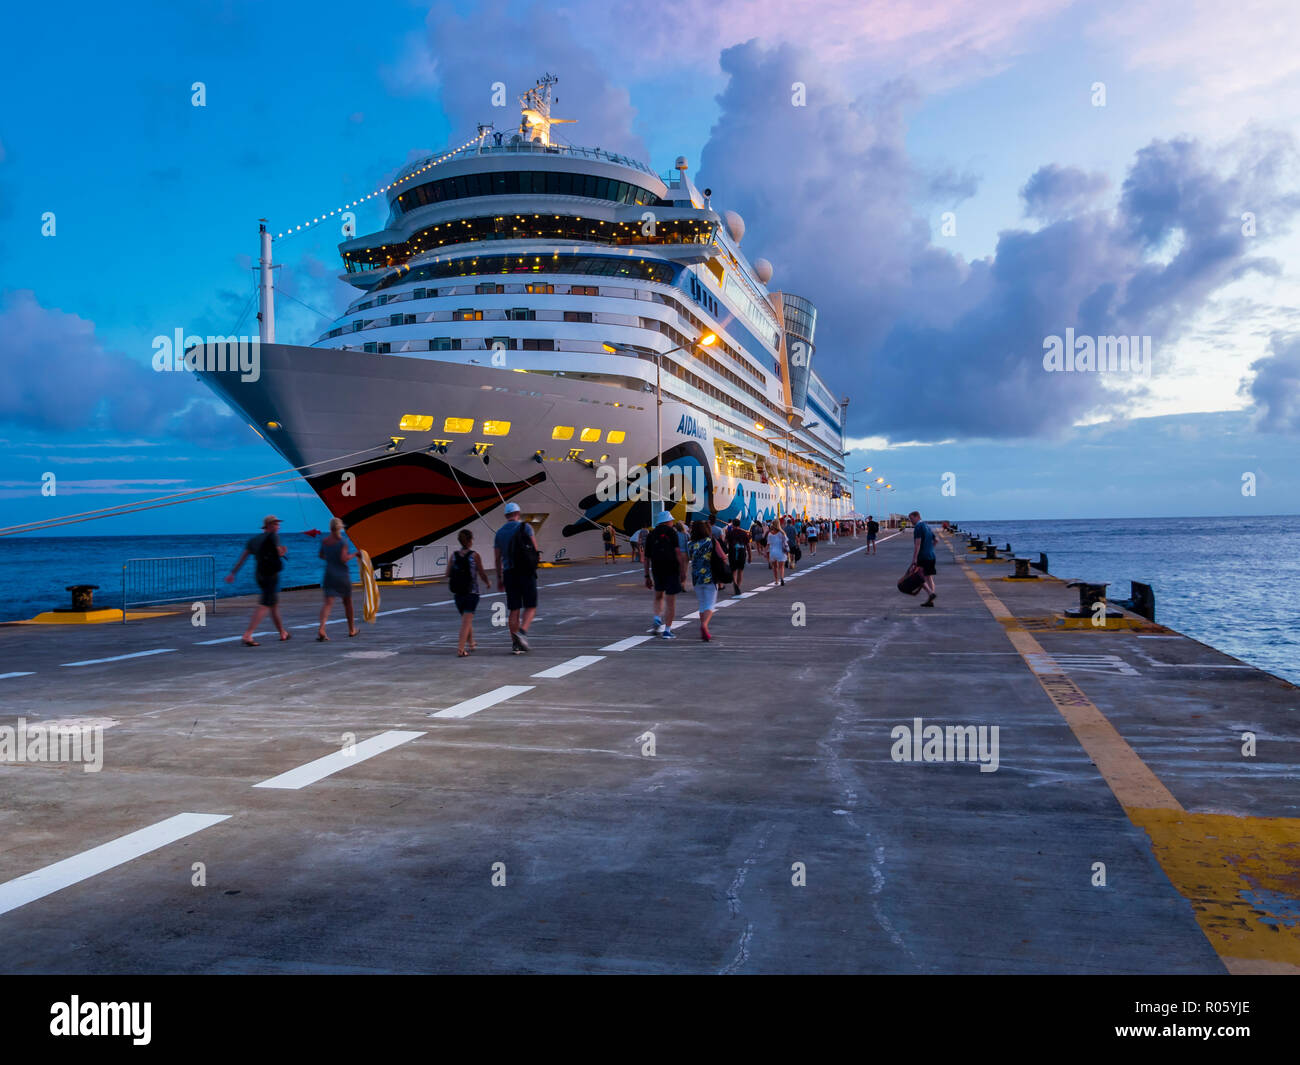 Cruise ship at dusk, Philippsburg, Caribbean, Sint Maarten, Niederlande - Stock Image